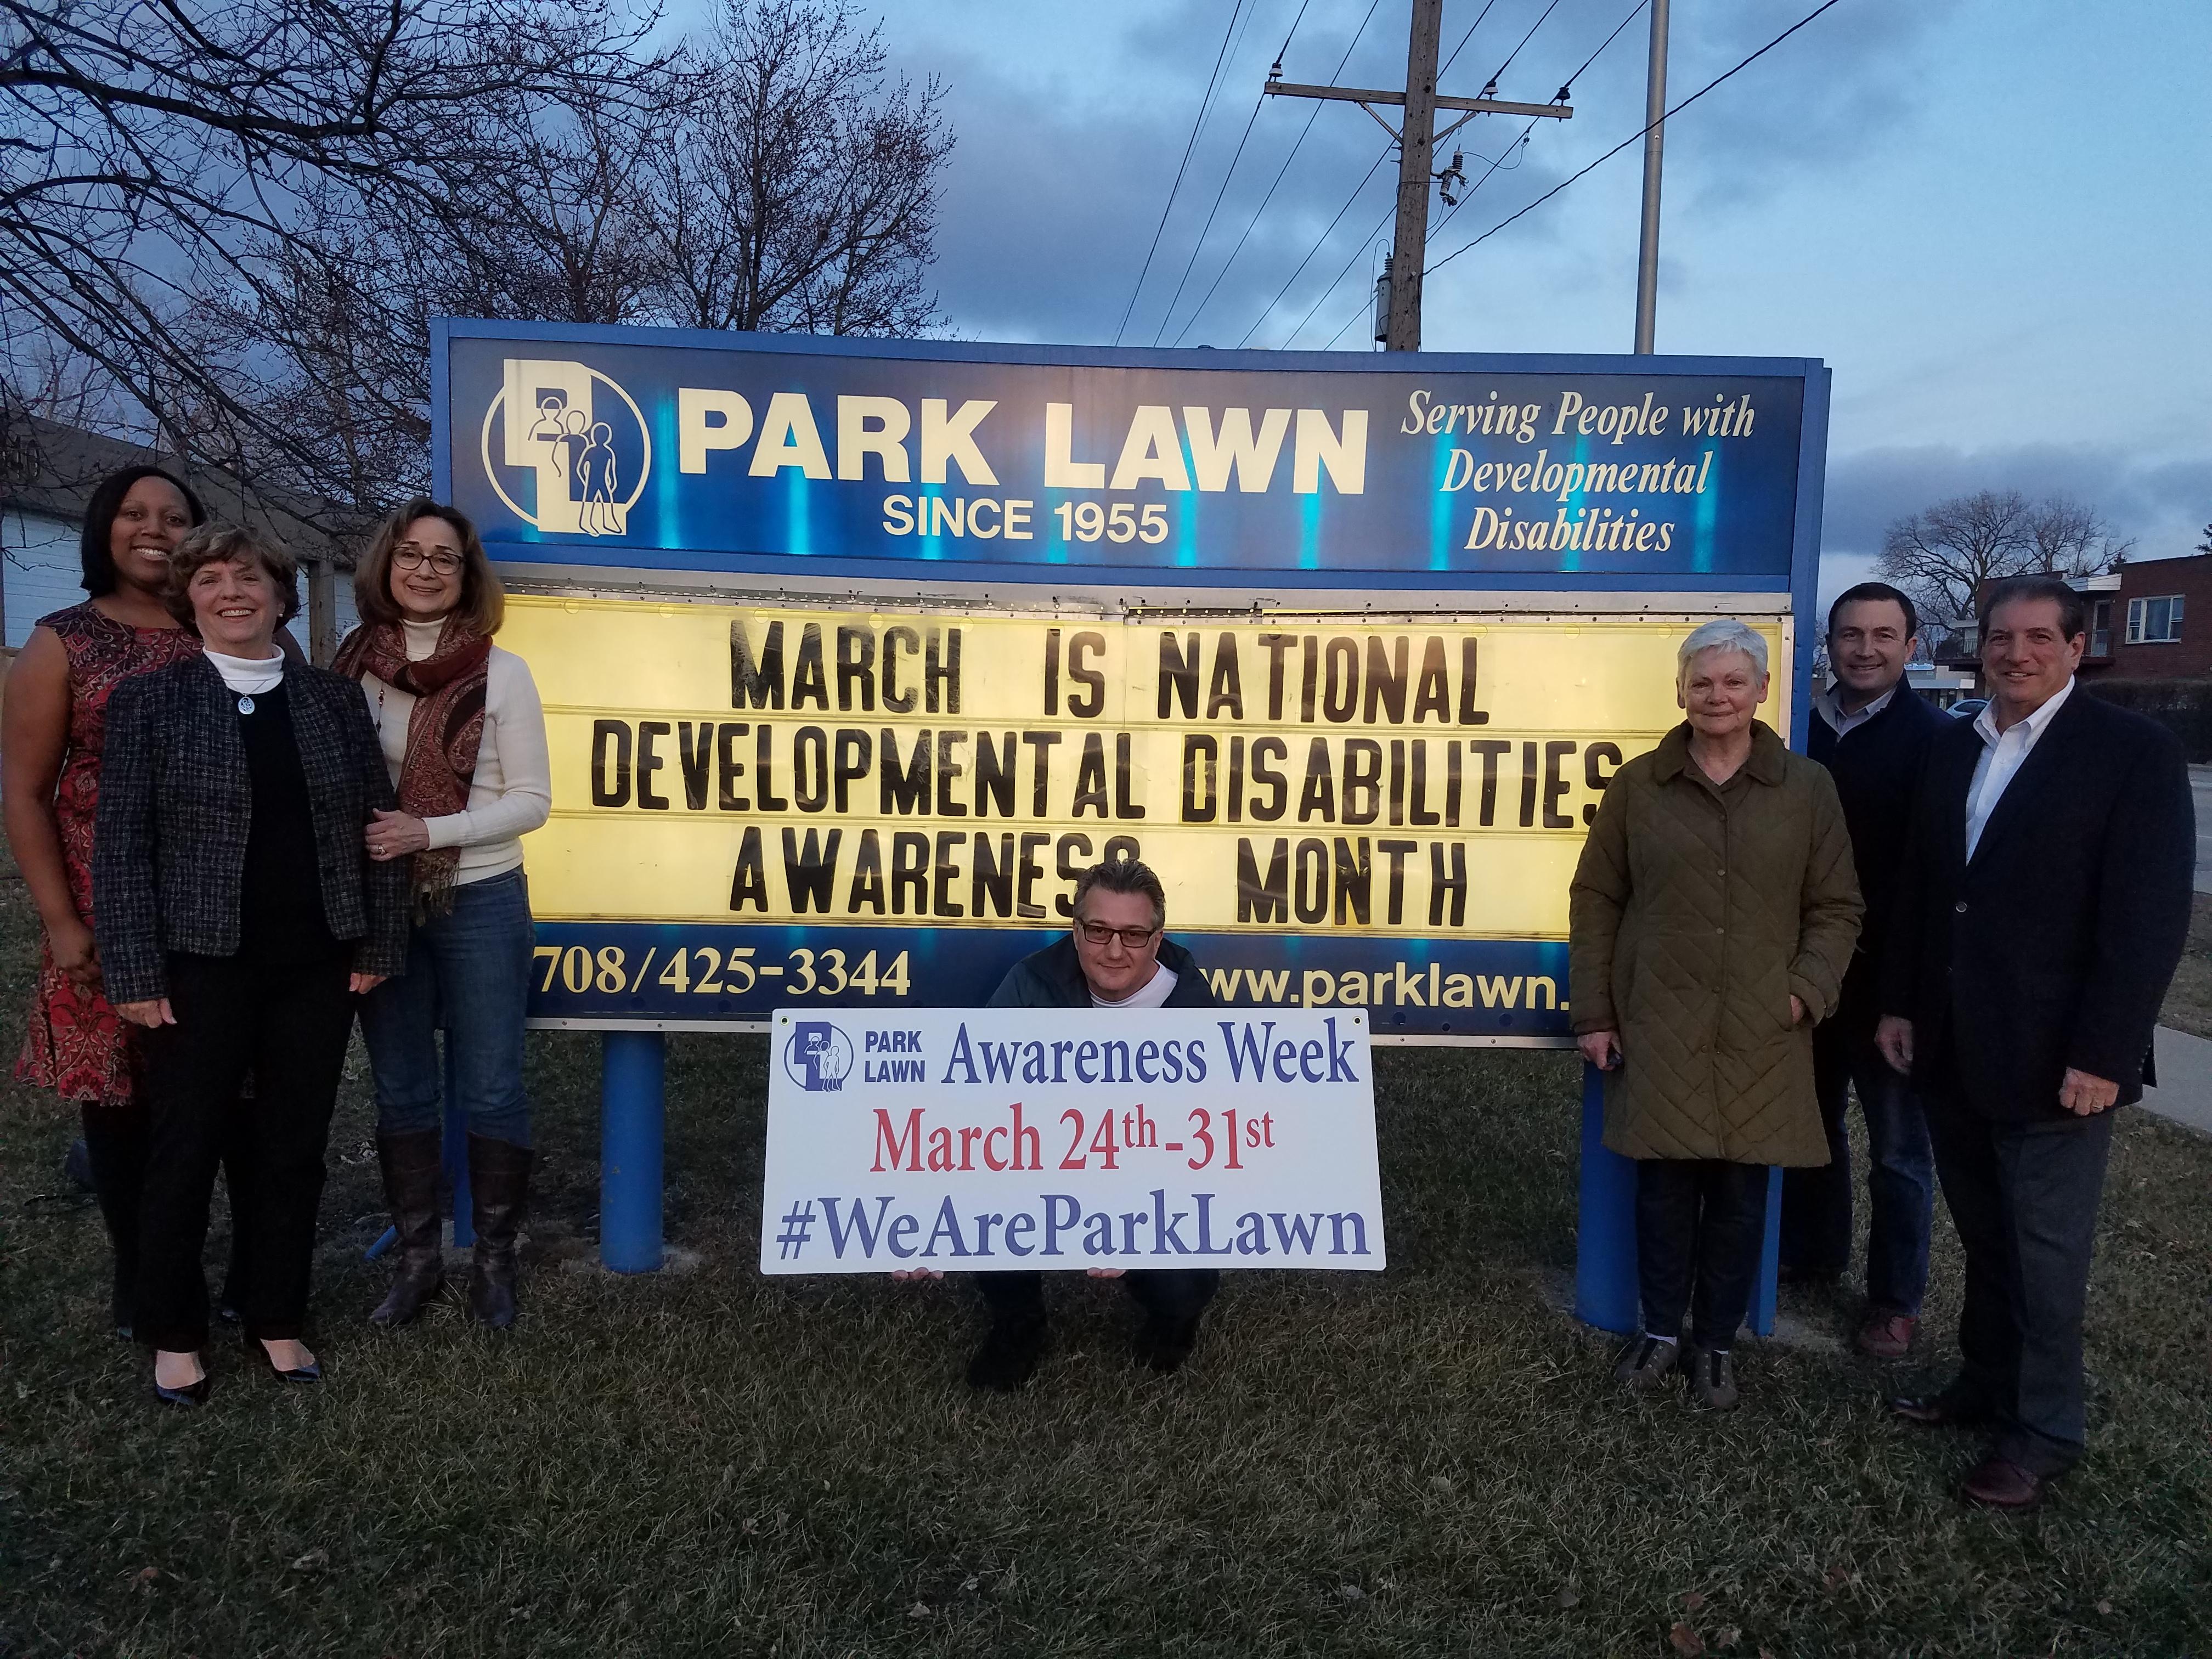 Park Lawn Awareness Week